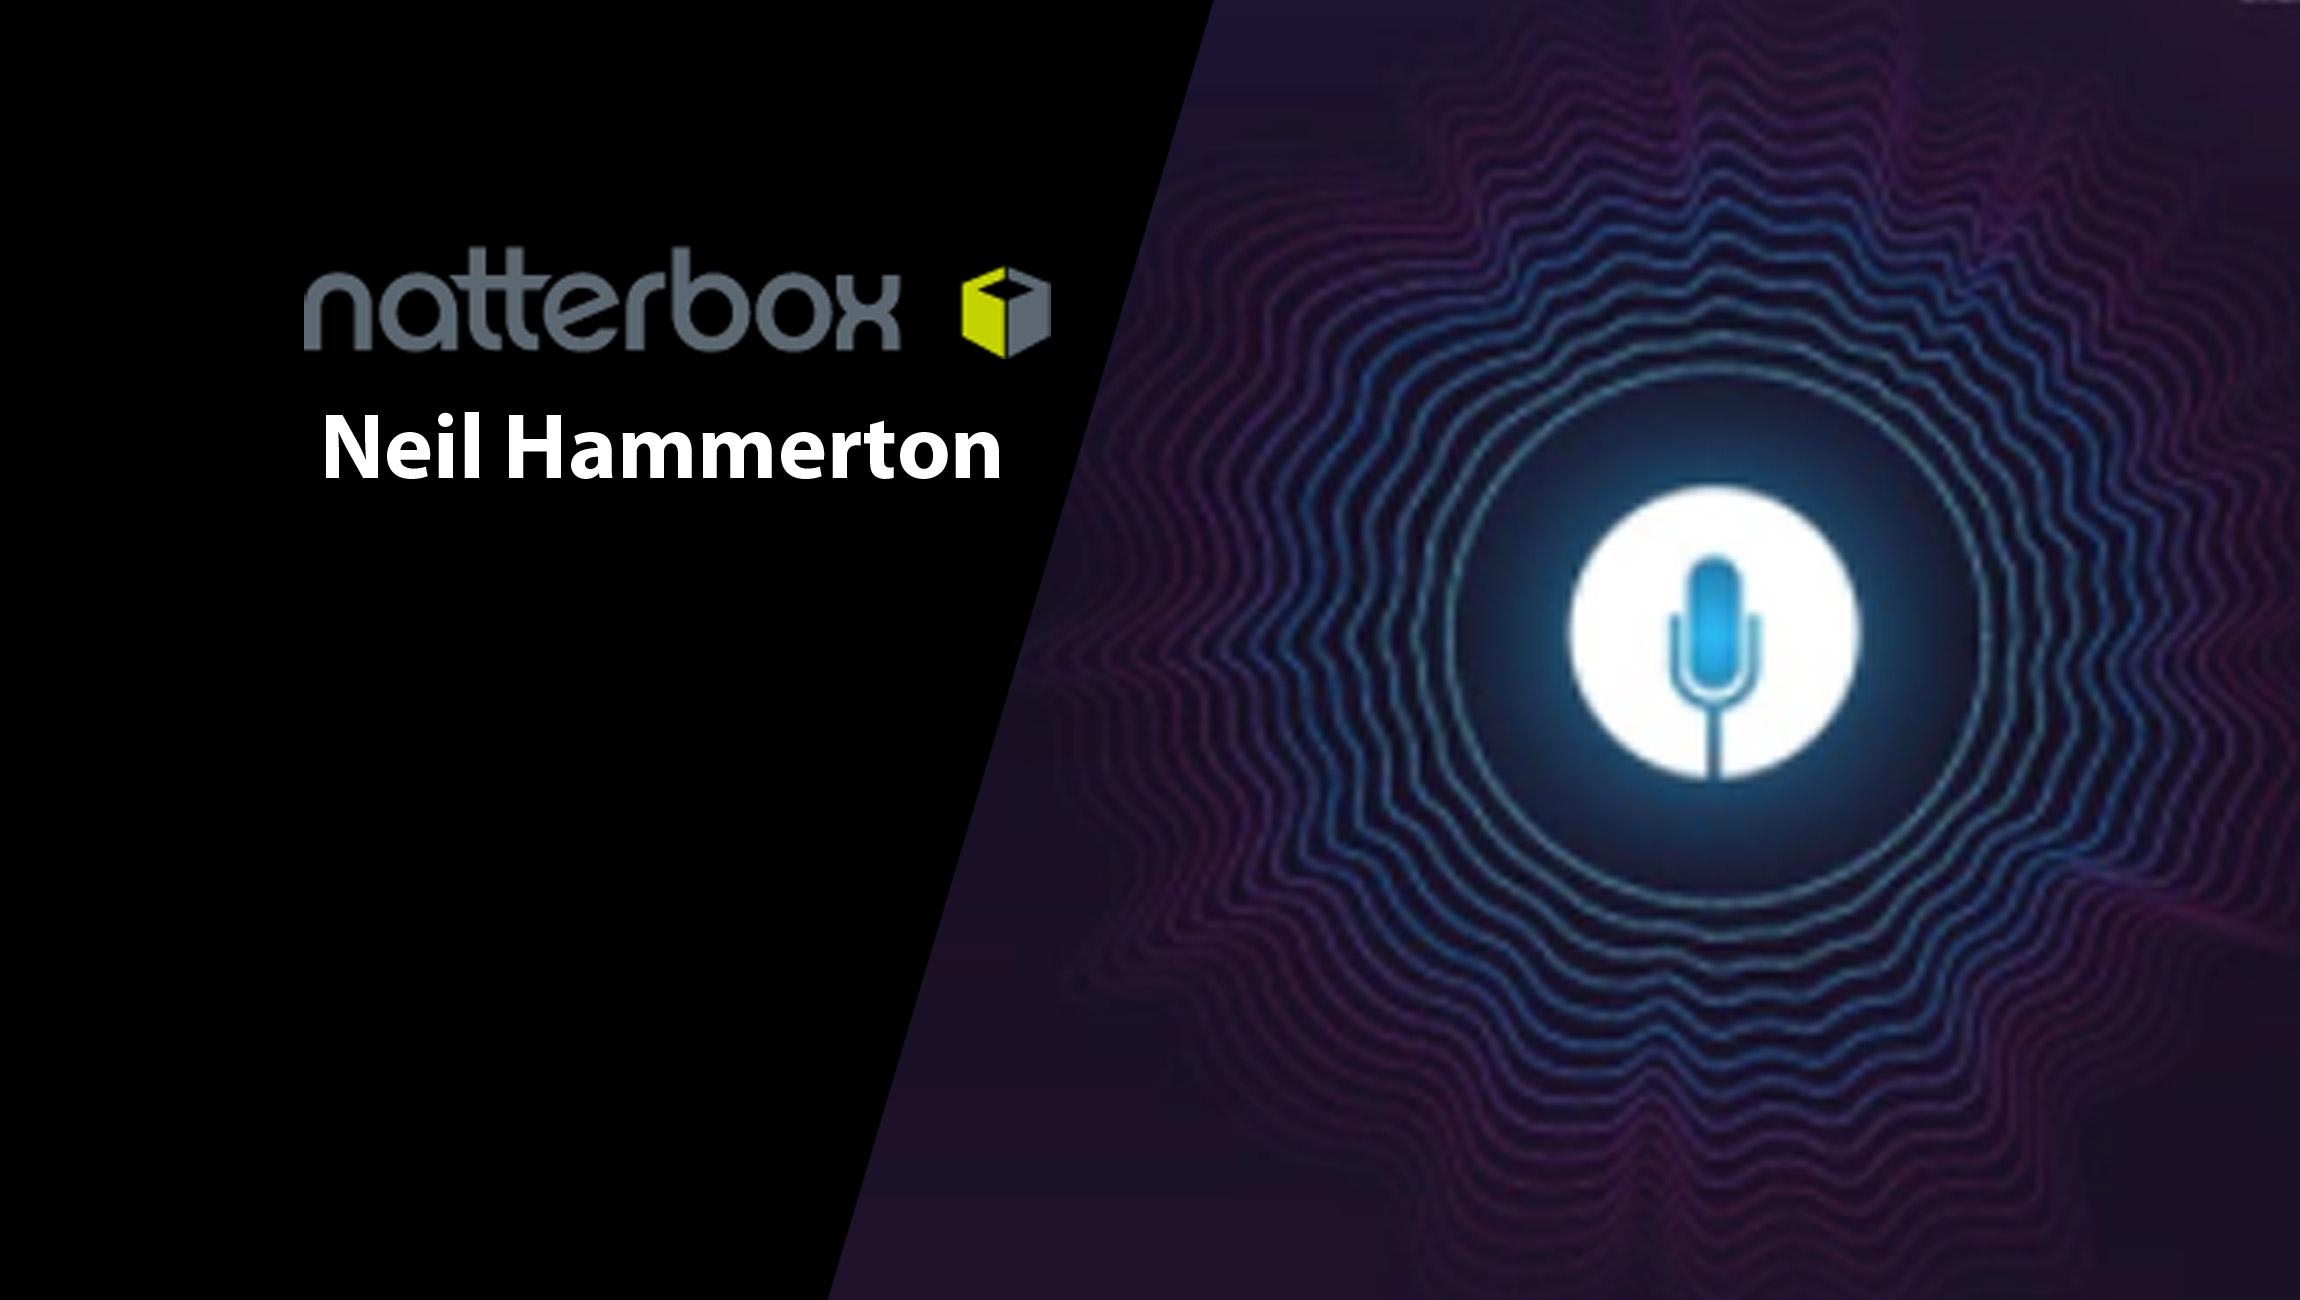 Neil-Hammerton_SalesTechStar-Natterbox